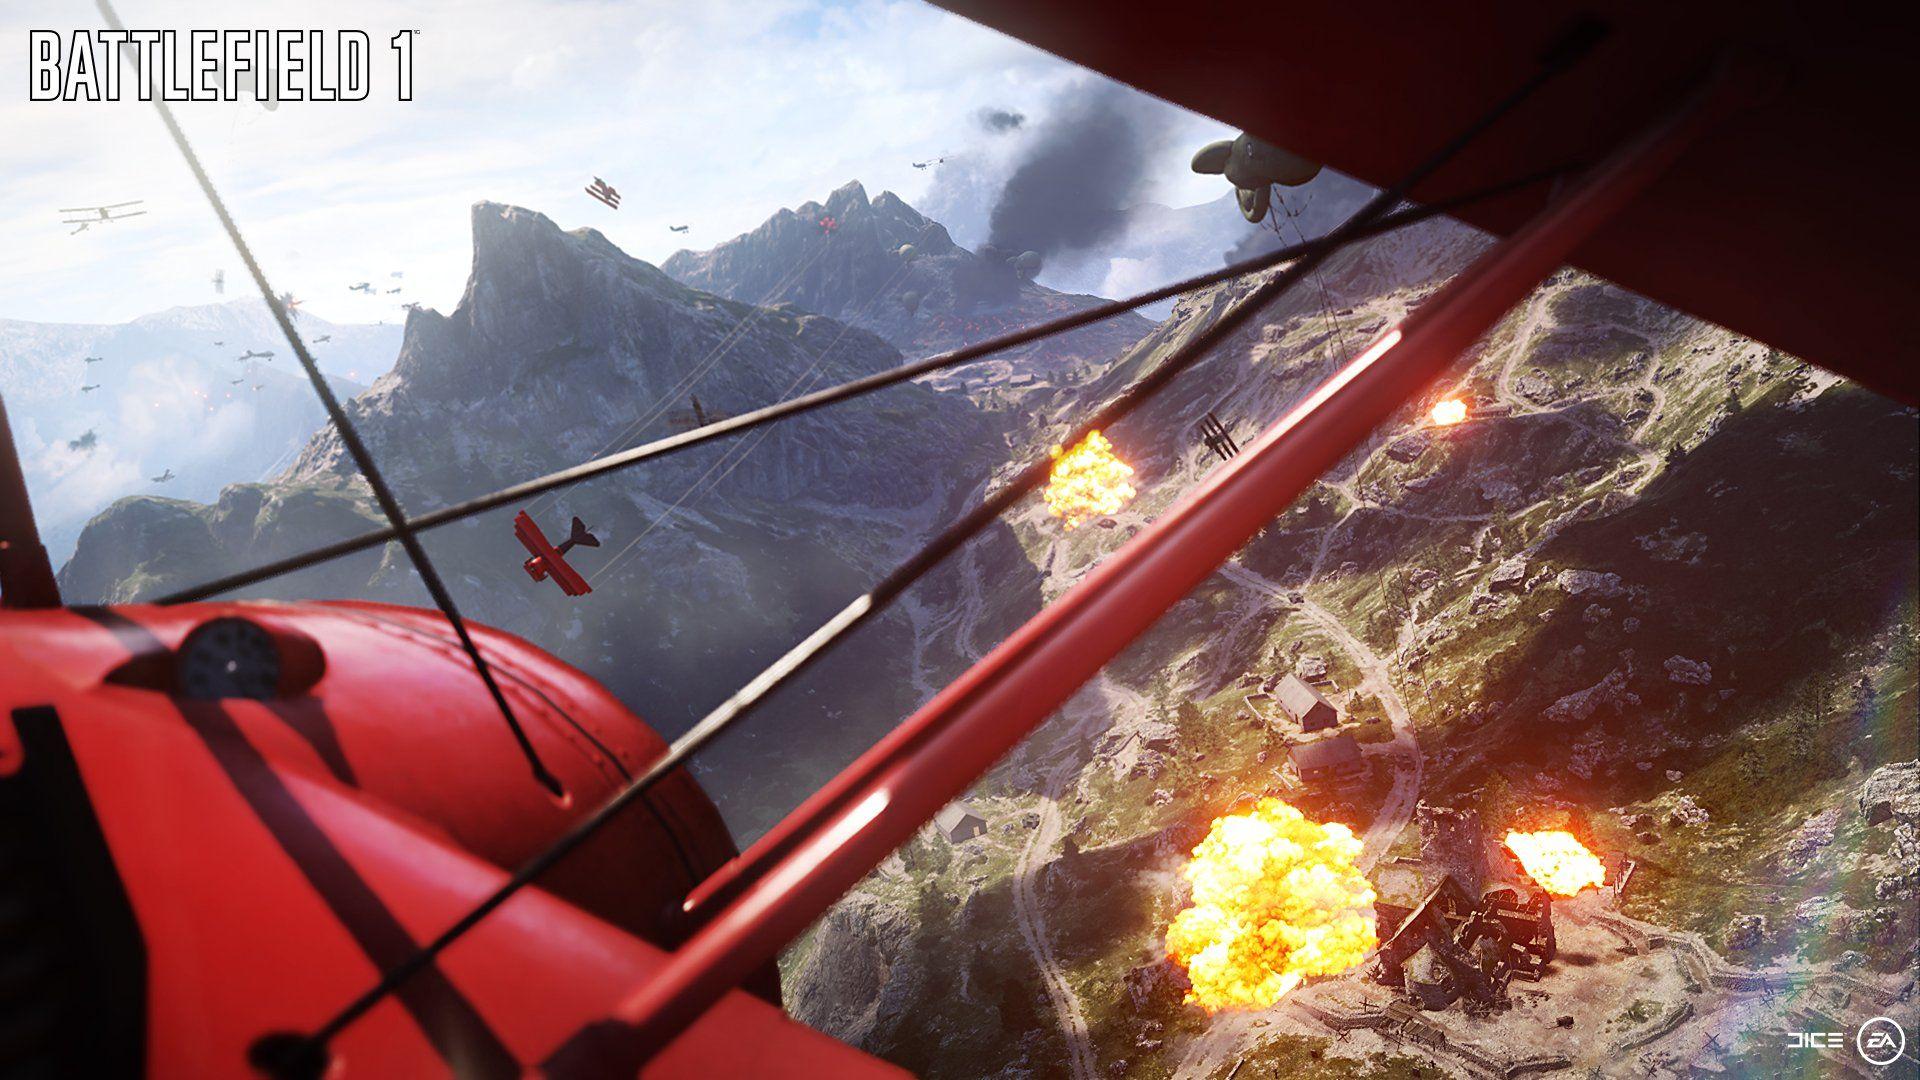 Wallpaper Battlefield 1 Ea Dice Shooter Games Videogames